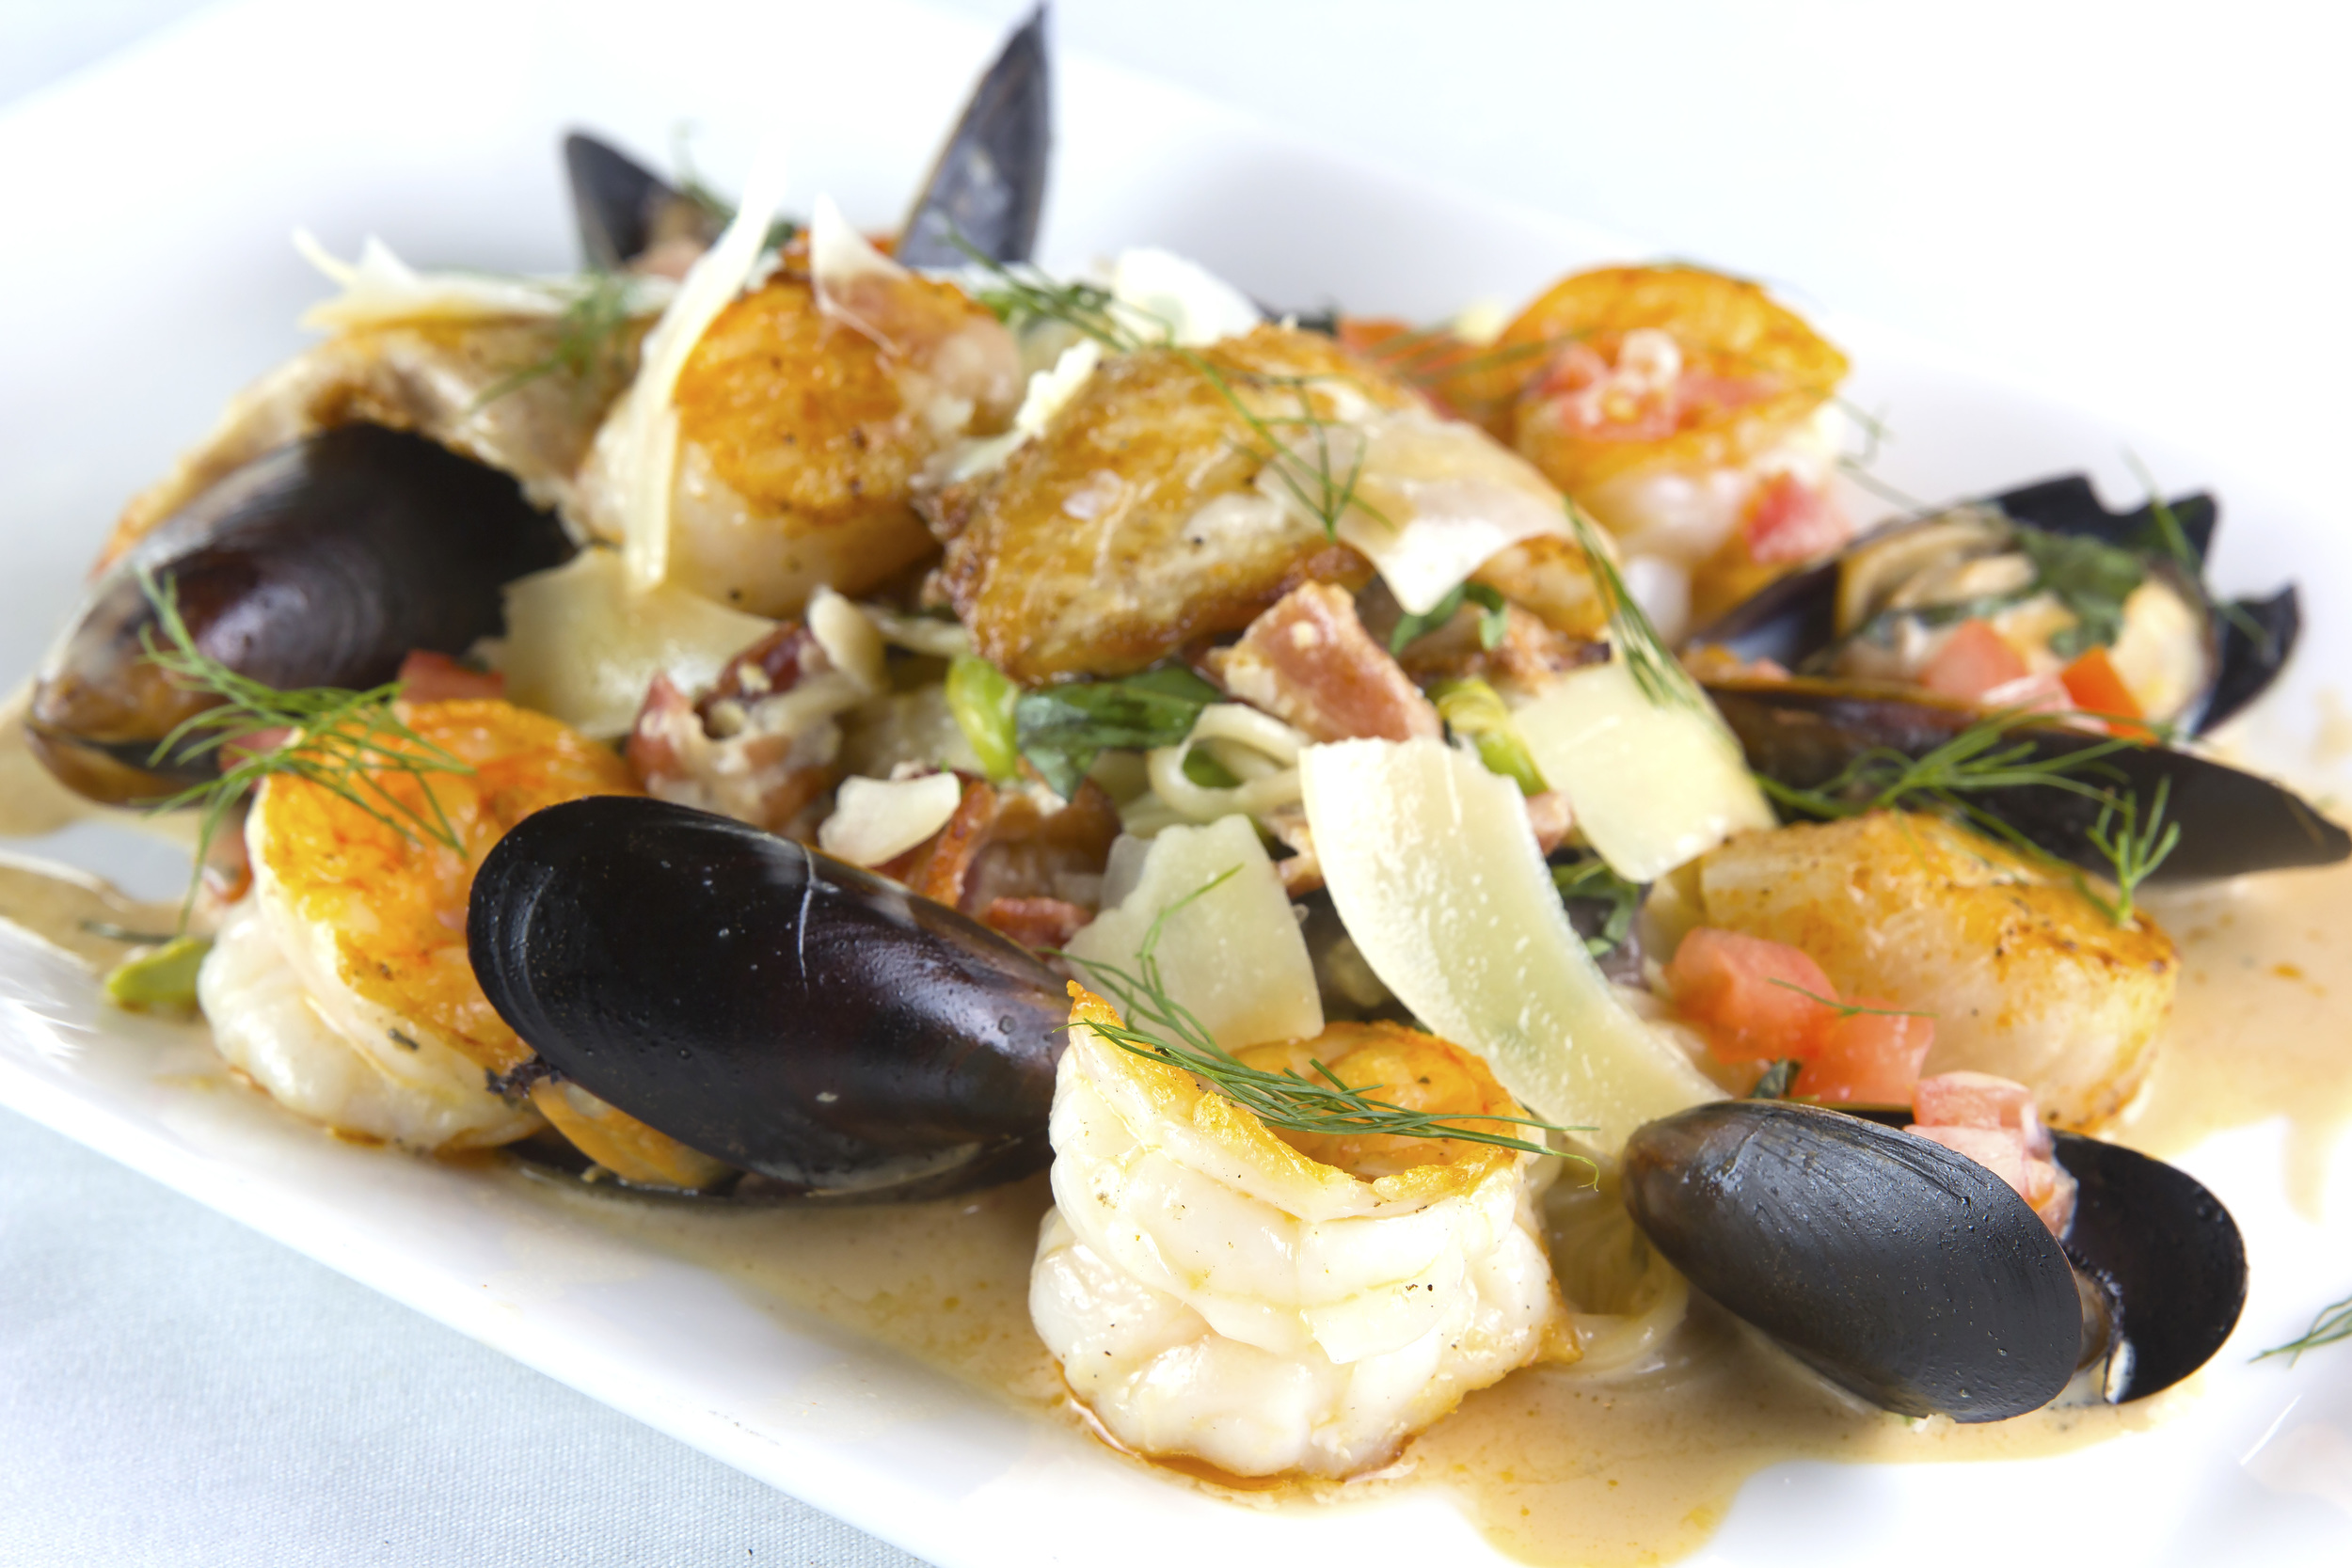 160121_Sperata_restaurant_food.0133.jpg